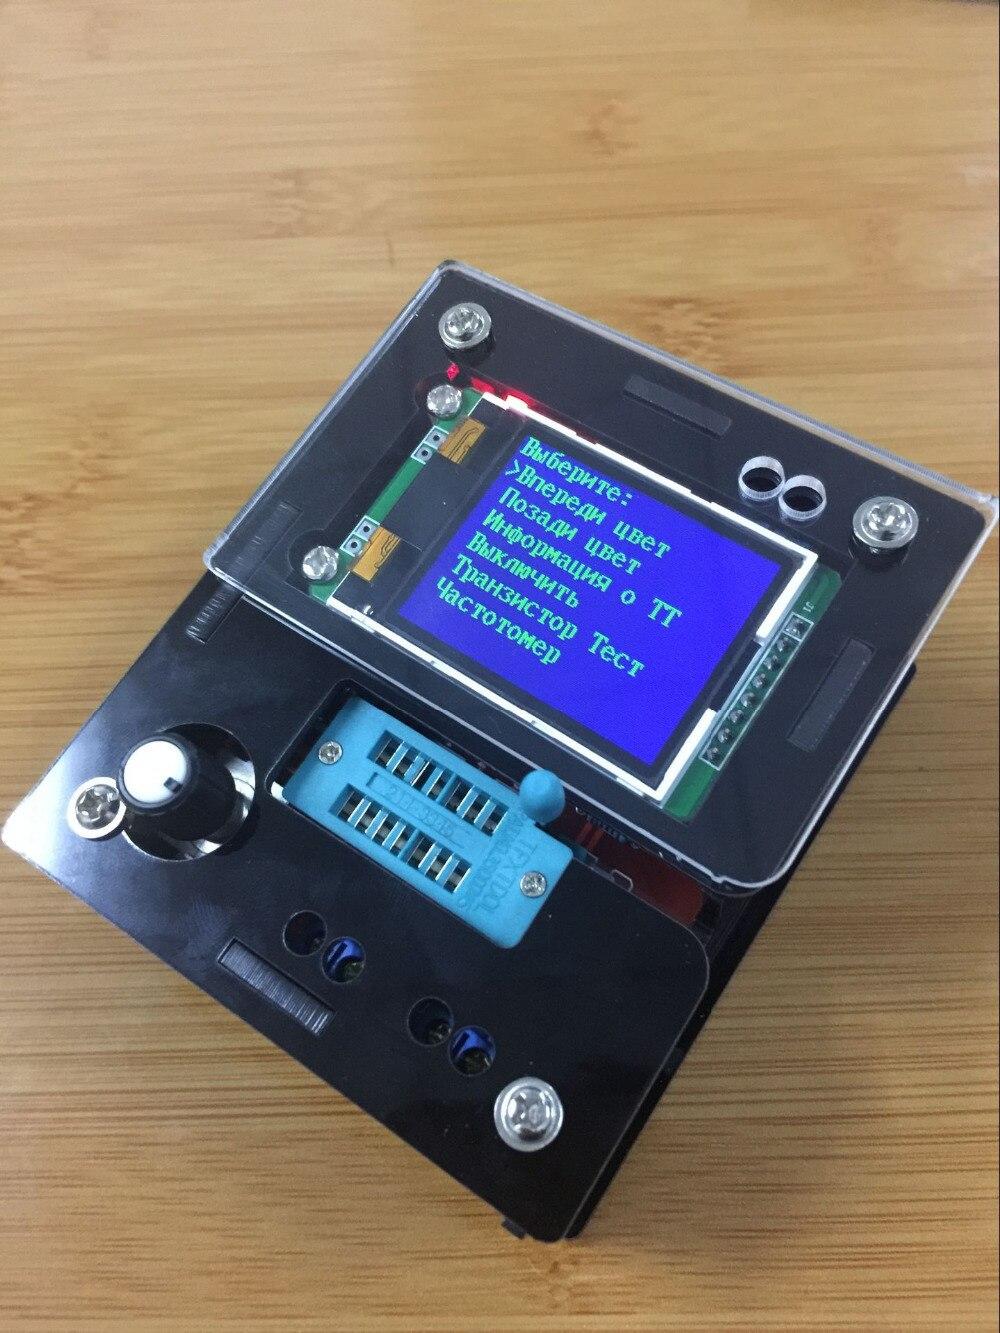 Russian mega328 DIY kits Transistor Tester LCR Diode Capacitance ESR meter PWM Square wave Frequency Signal Generator|tester lcr|generator metermeter lcr - AliExpress